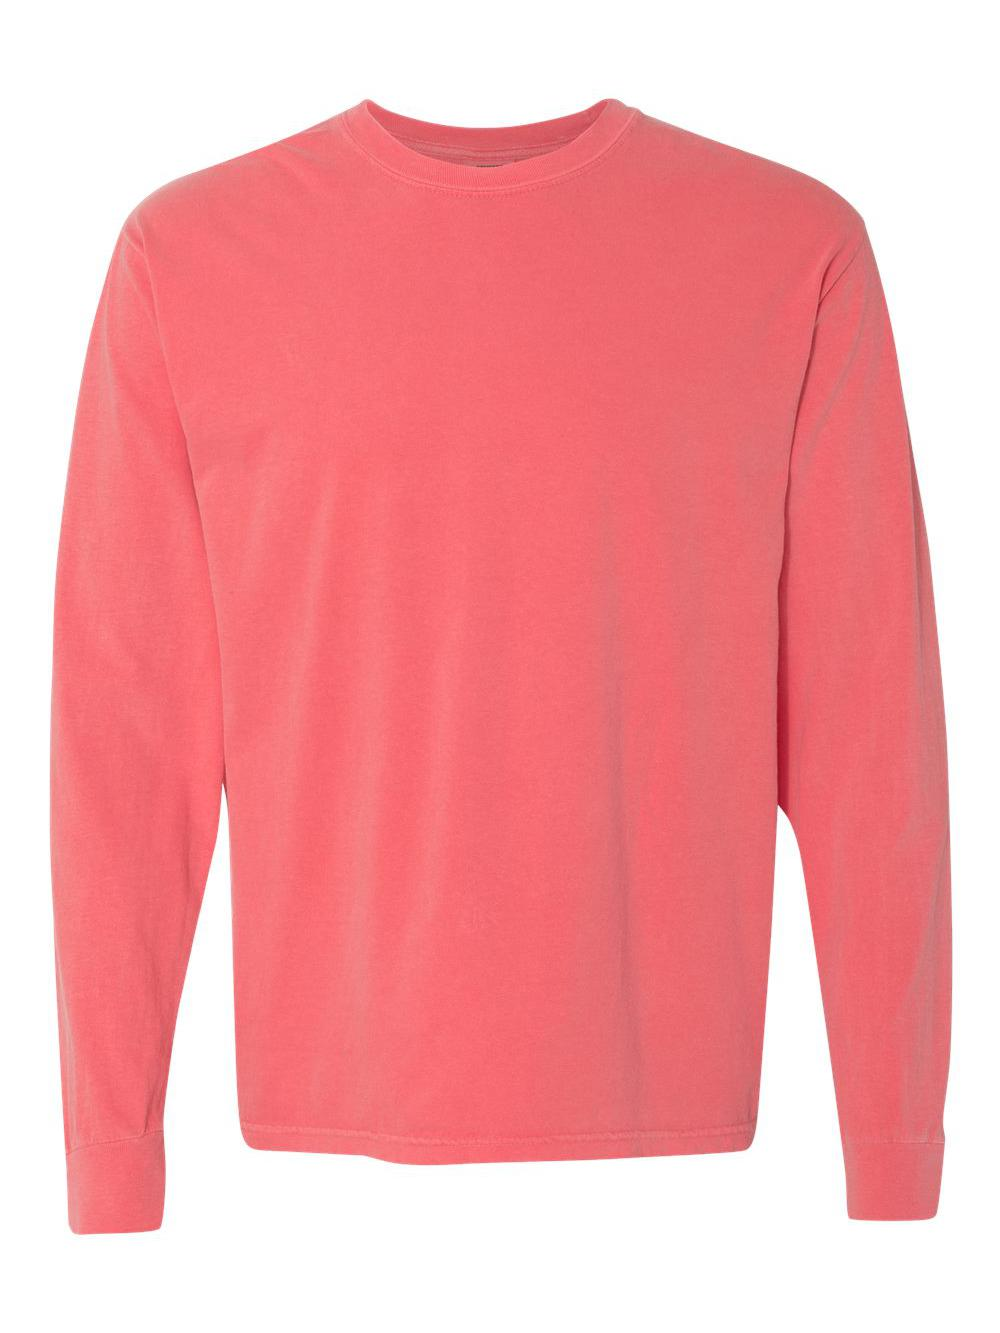 Comfort-Colors-Garment-Dyed-Heavyweight-Ringspun-Long-Sleeve-T-Shirt-6014 thumbnail 69